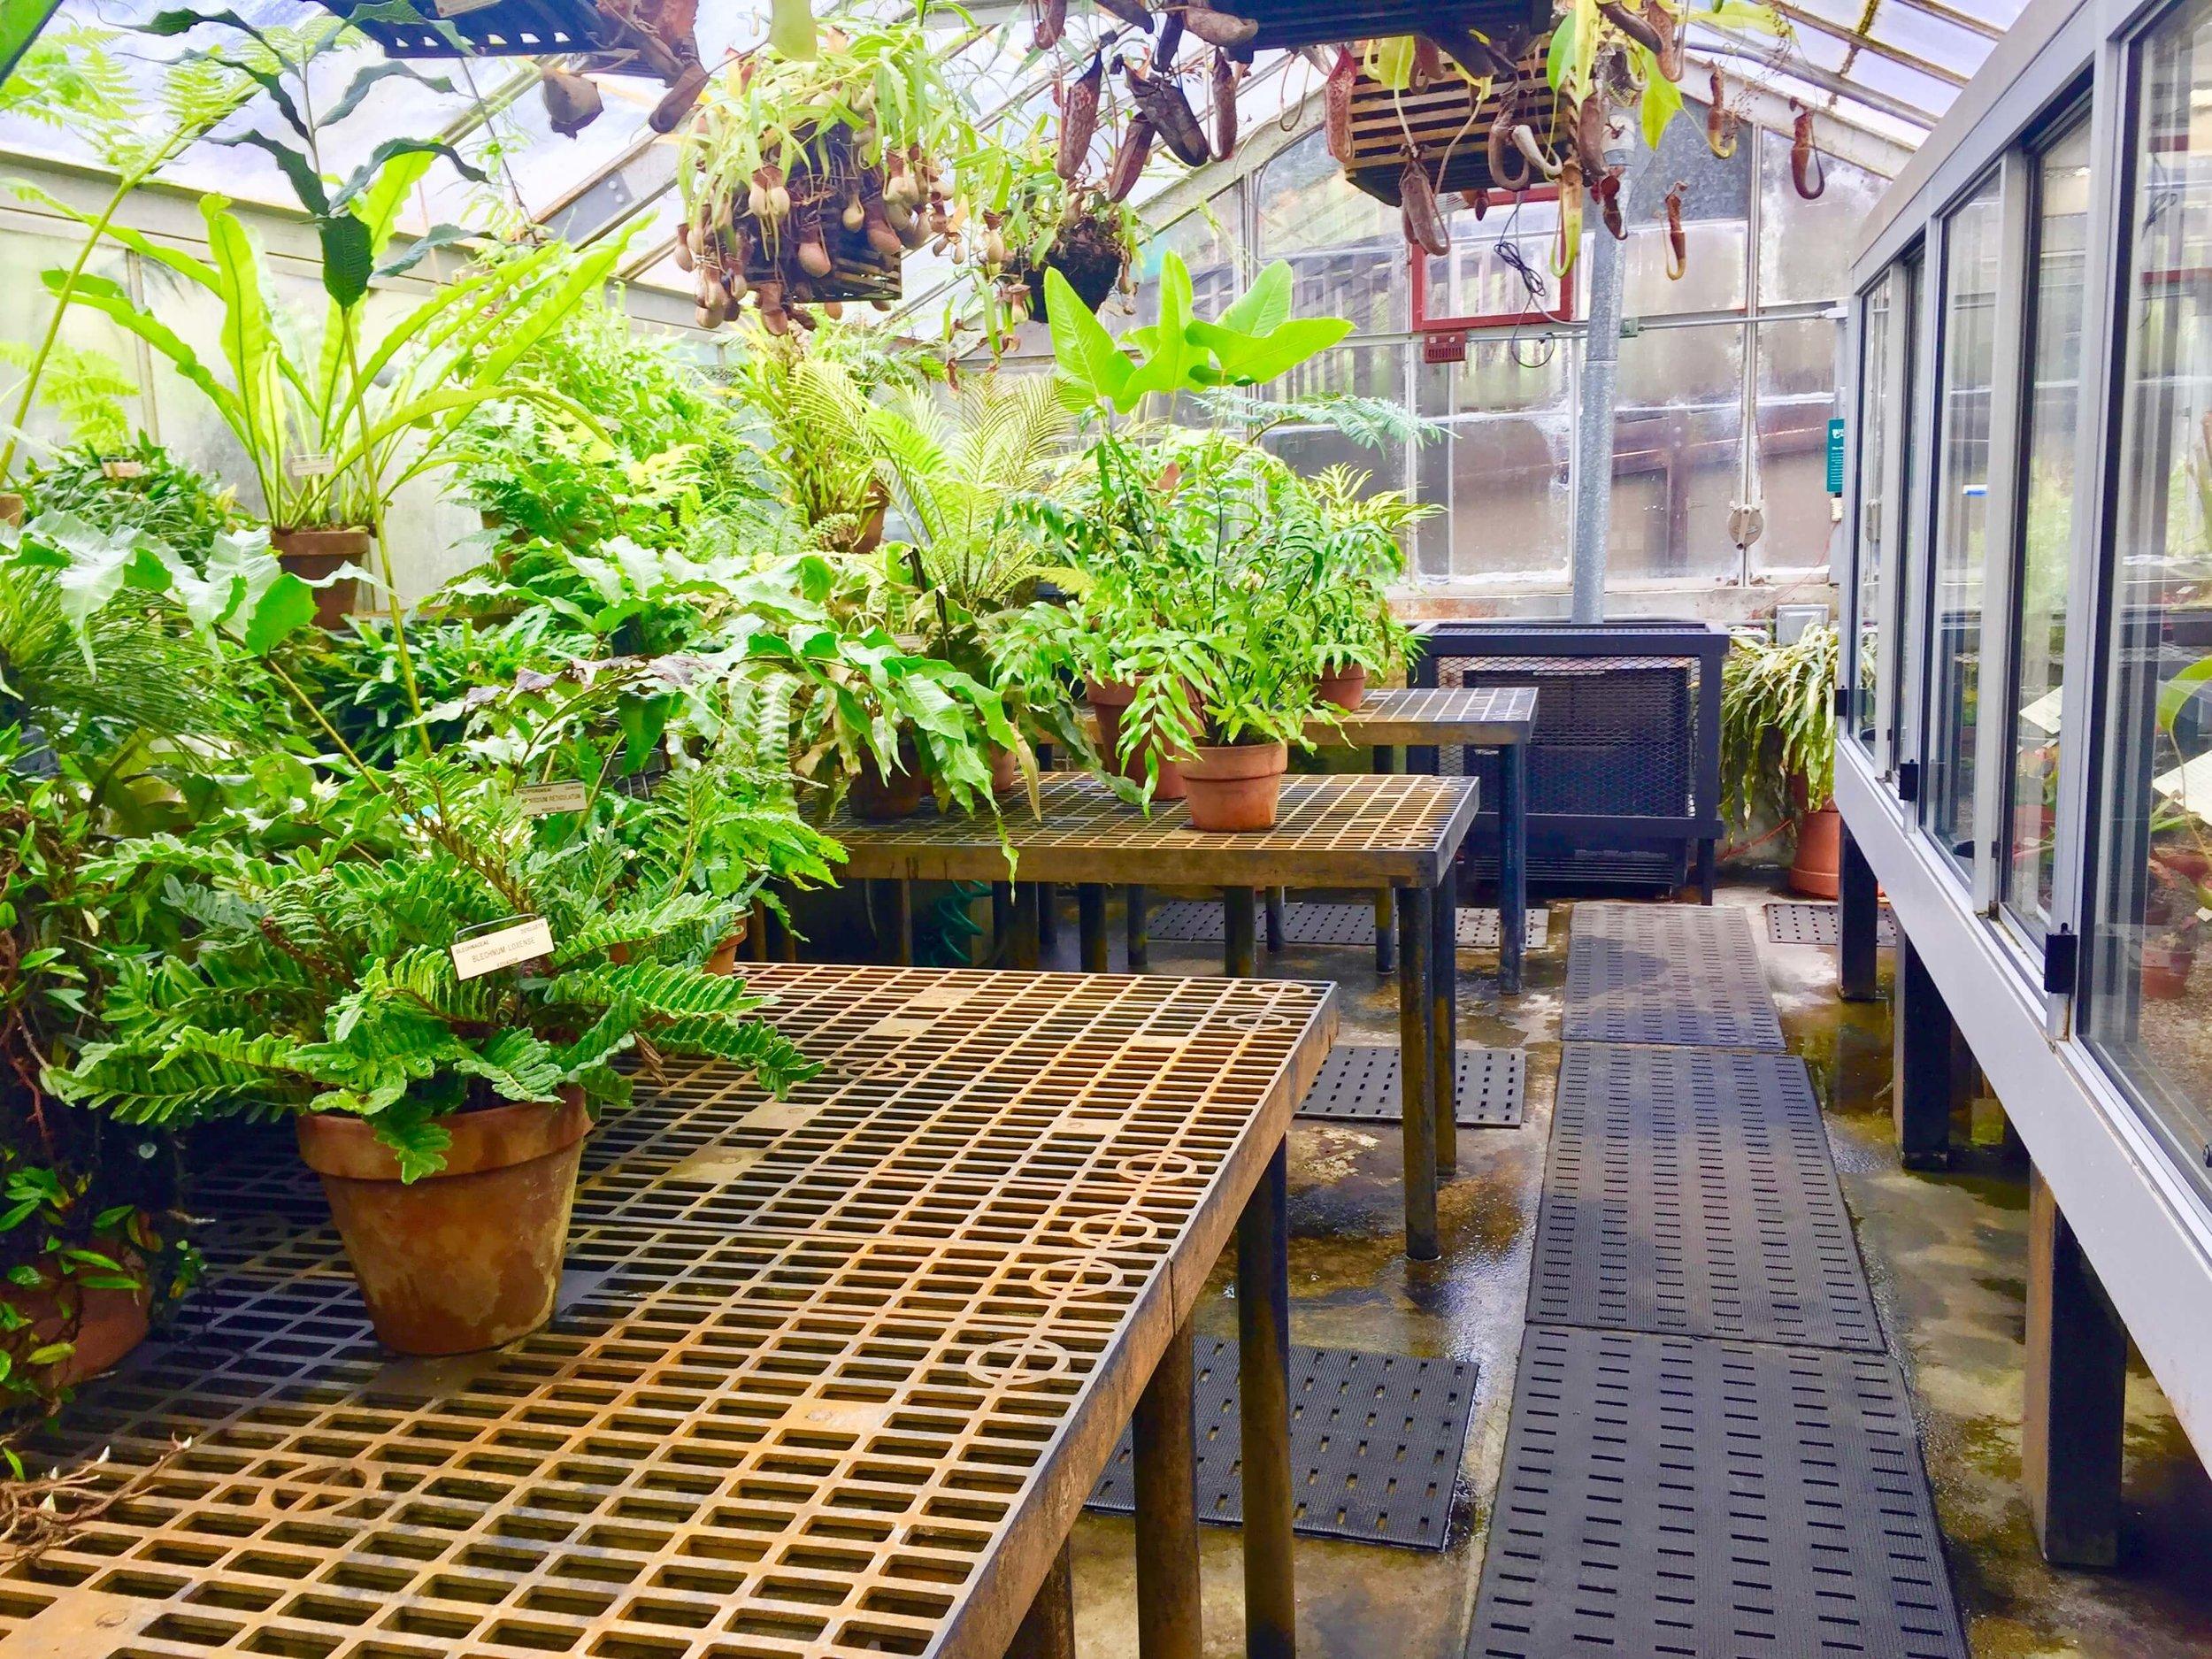 7-University of California Botanical Garden at UC Berkeley-The Sibbett Group-Greenhouse.jpg